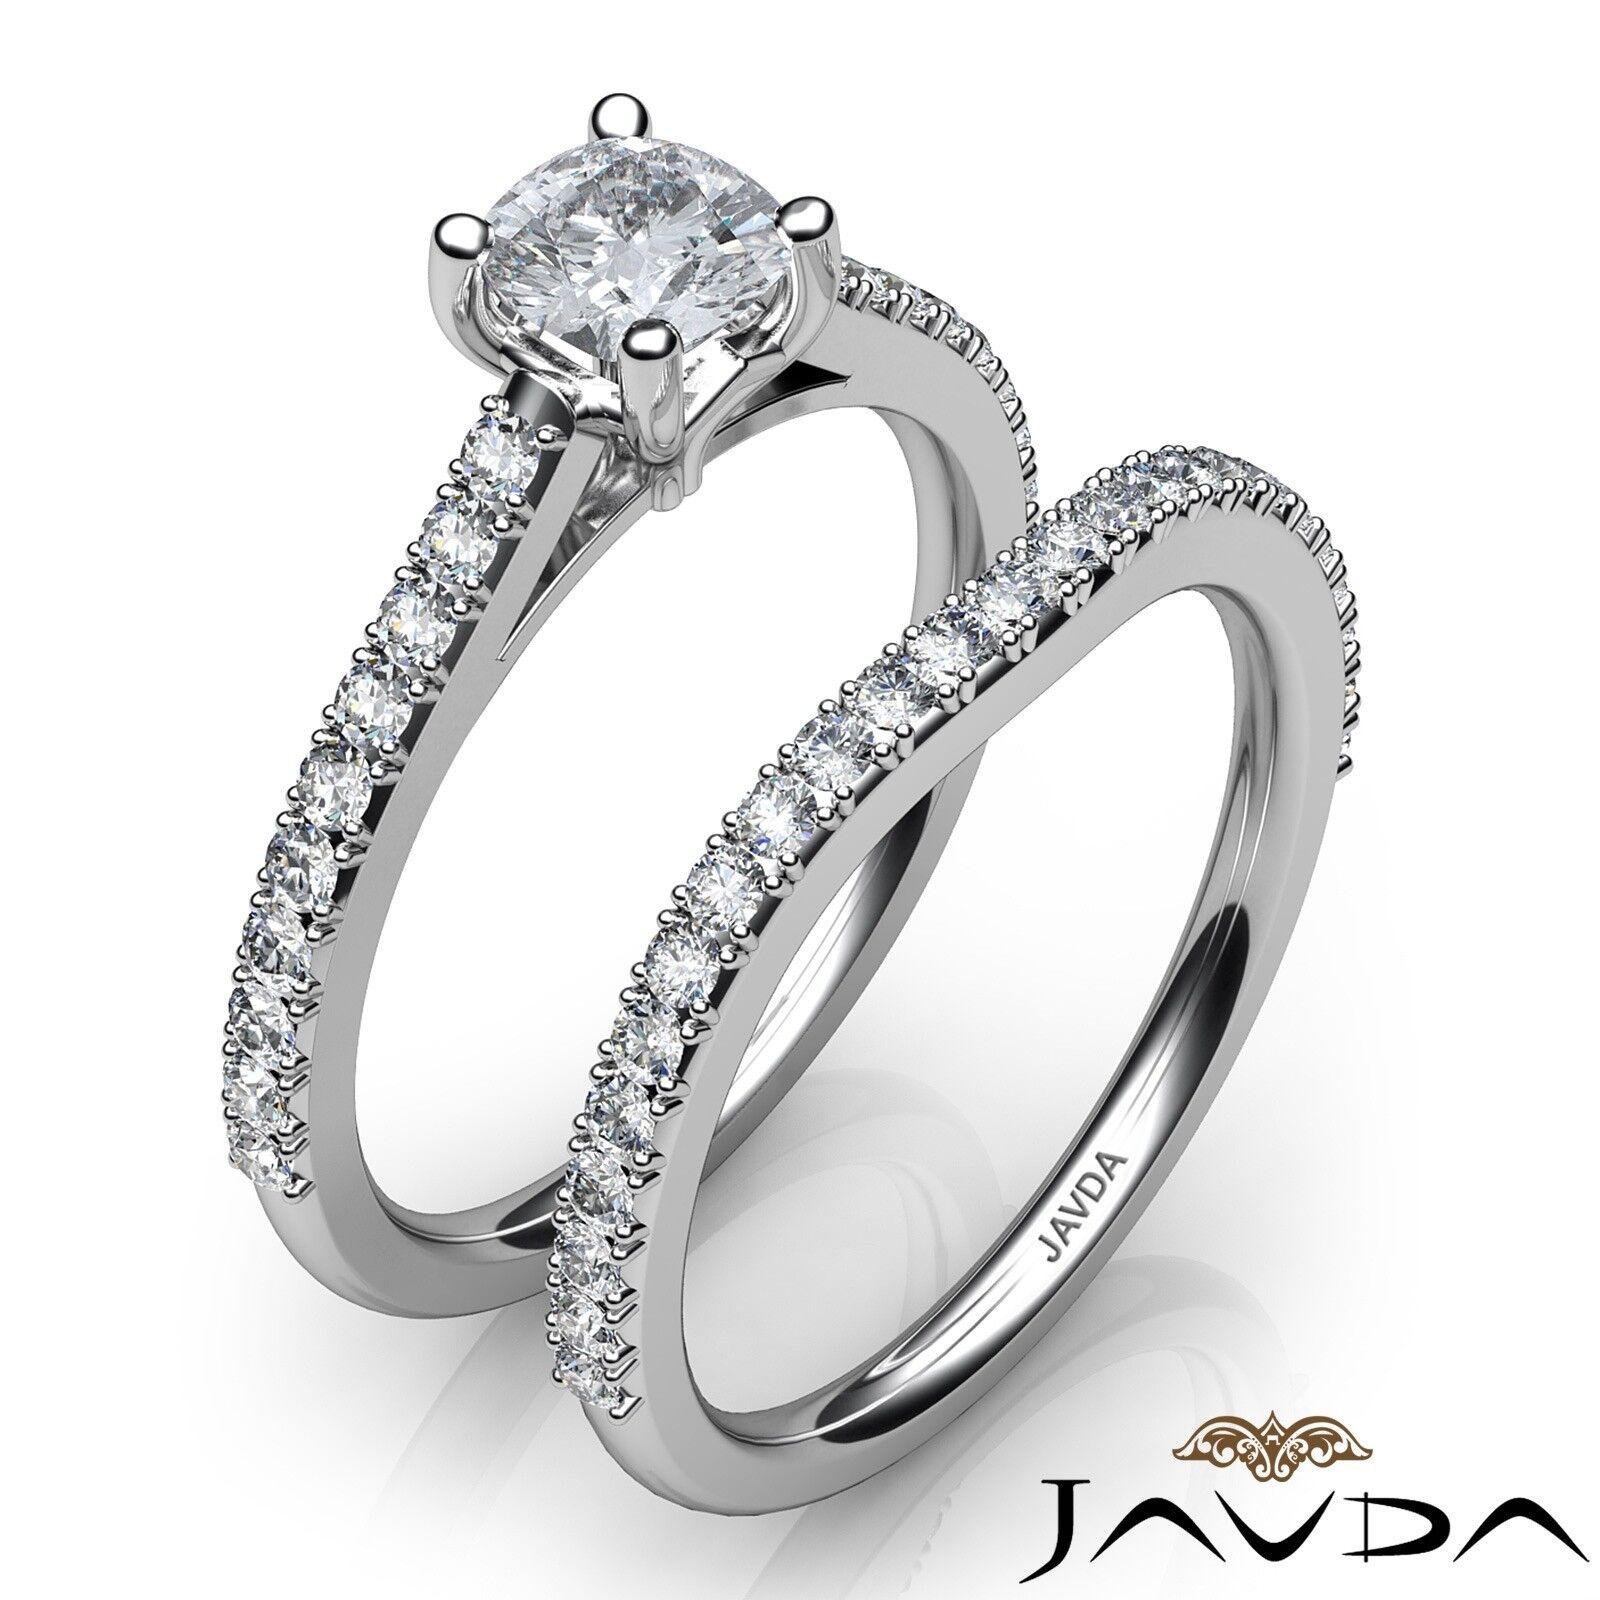 1.51ctw Double Prong Bridal Set Cushion Diamond Engagement Ring GIA F-VS1 W Gold 2